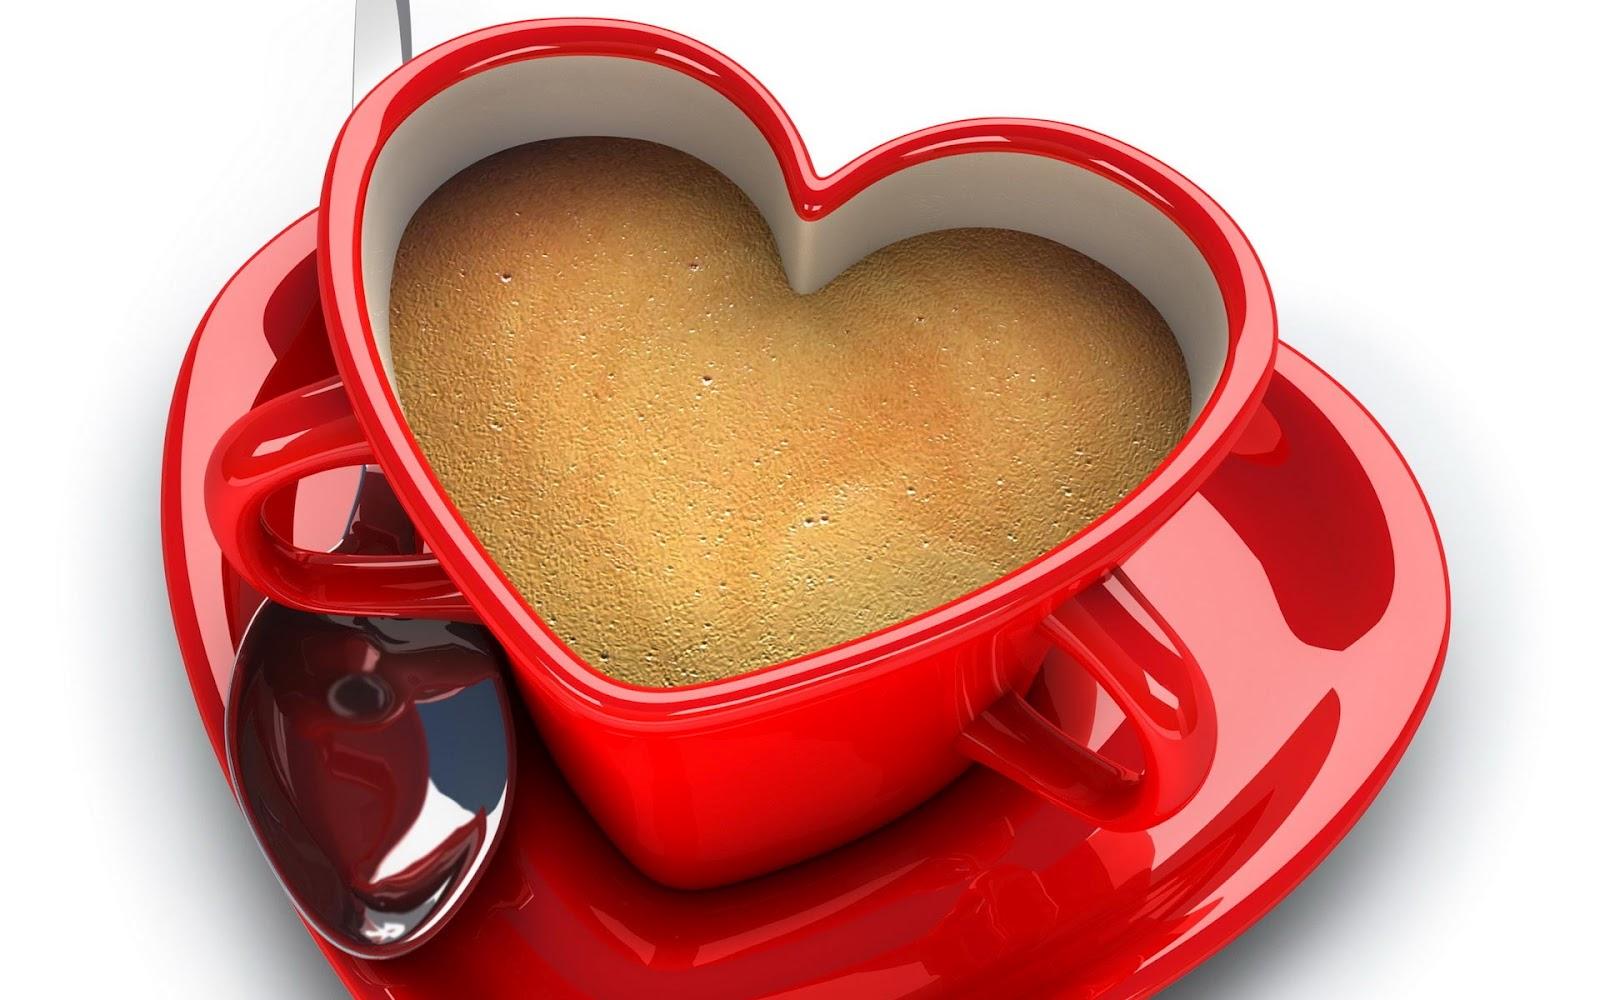 http://2.bp.blogspot.com/-sjEogOPQTdA/T9eFm9K817I/AAAAAAAAAYc/Ud27nkTaKAY/s1600/Coffee+lovers+Love+Wallpaper.jpg